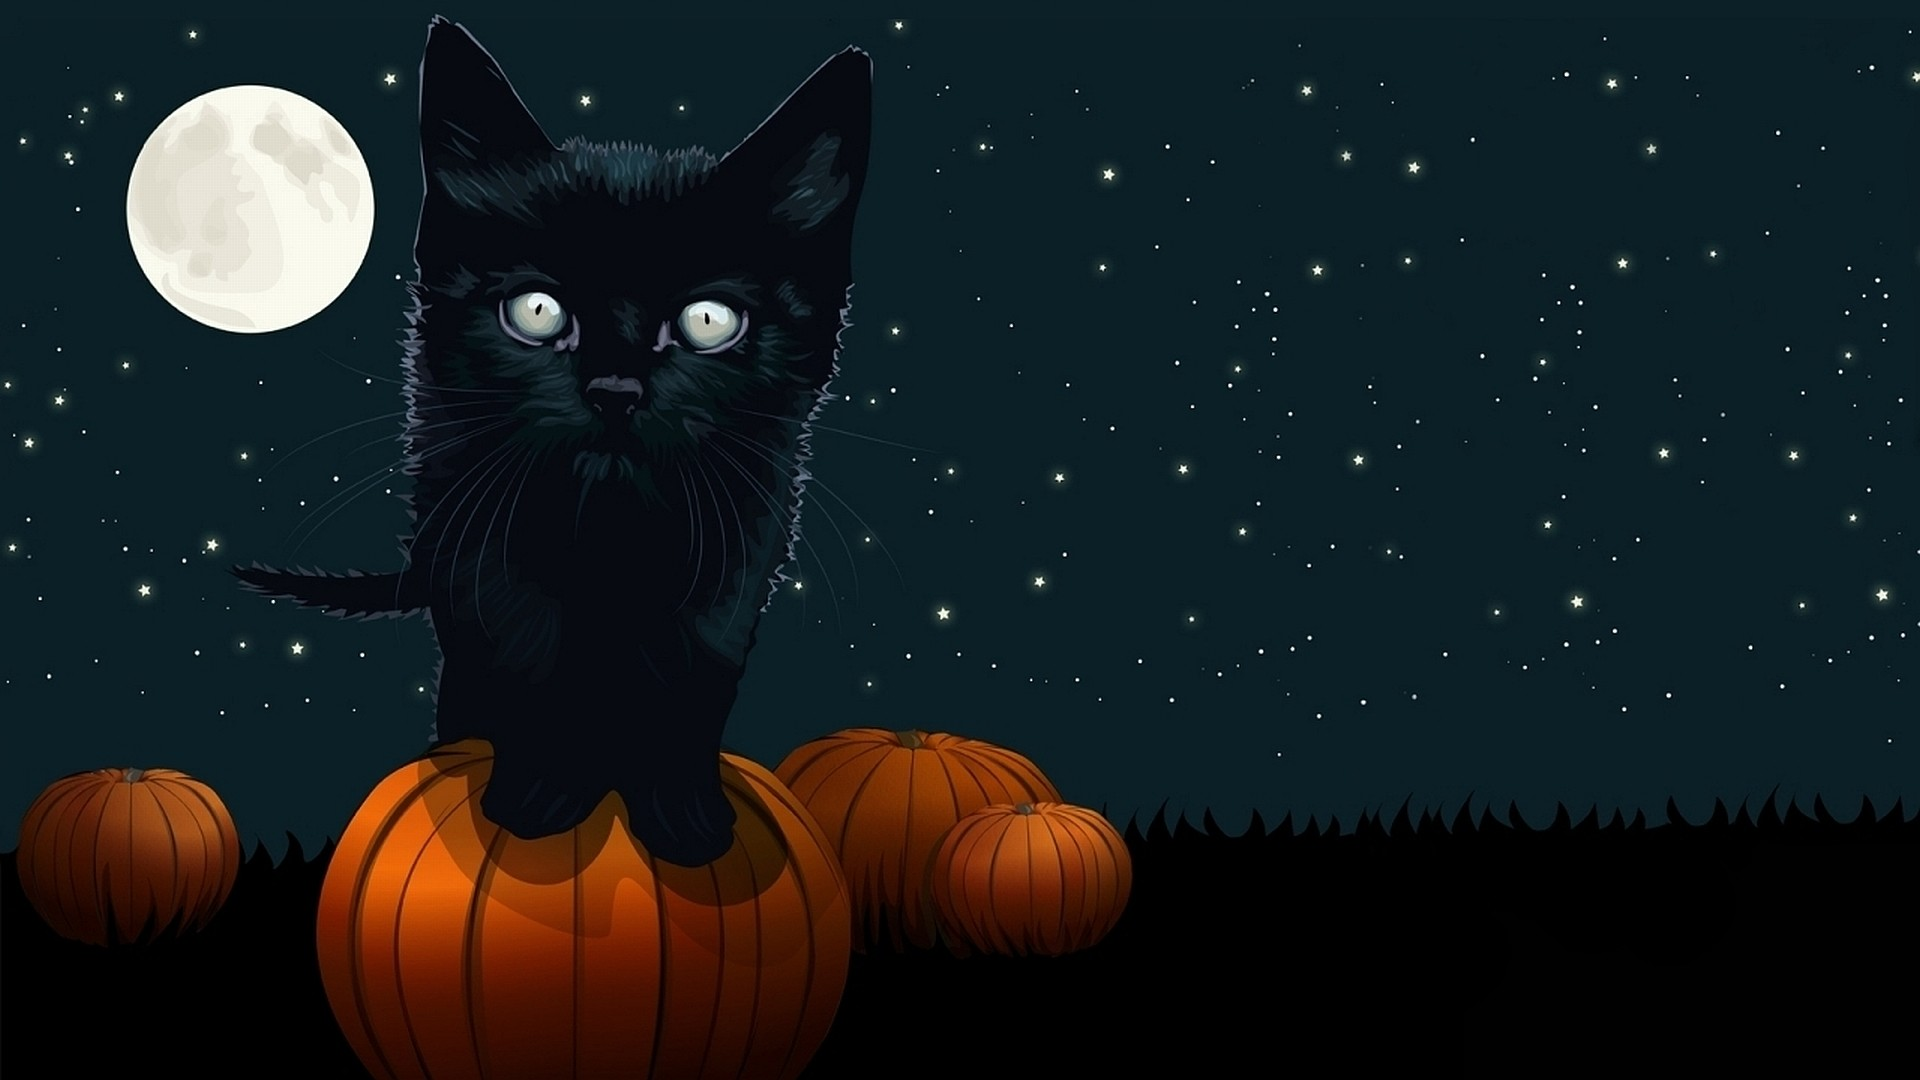 Halloween Desktop Wallpaper WallpaperSafari